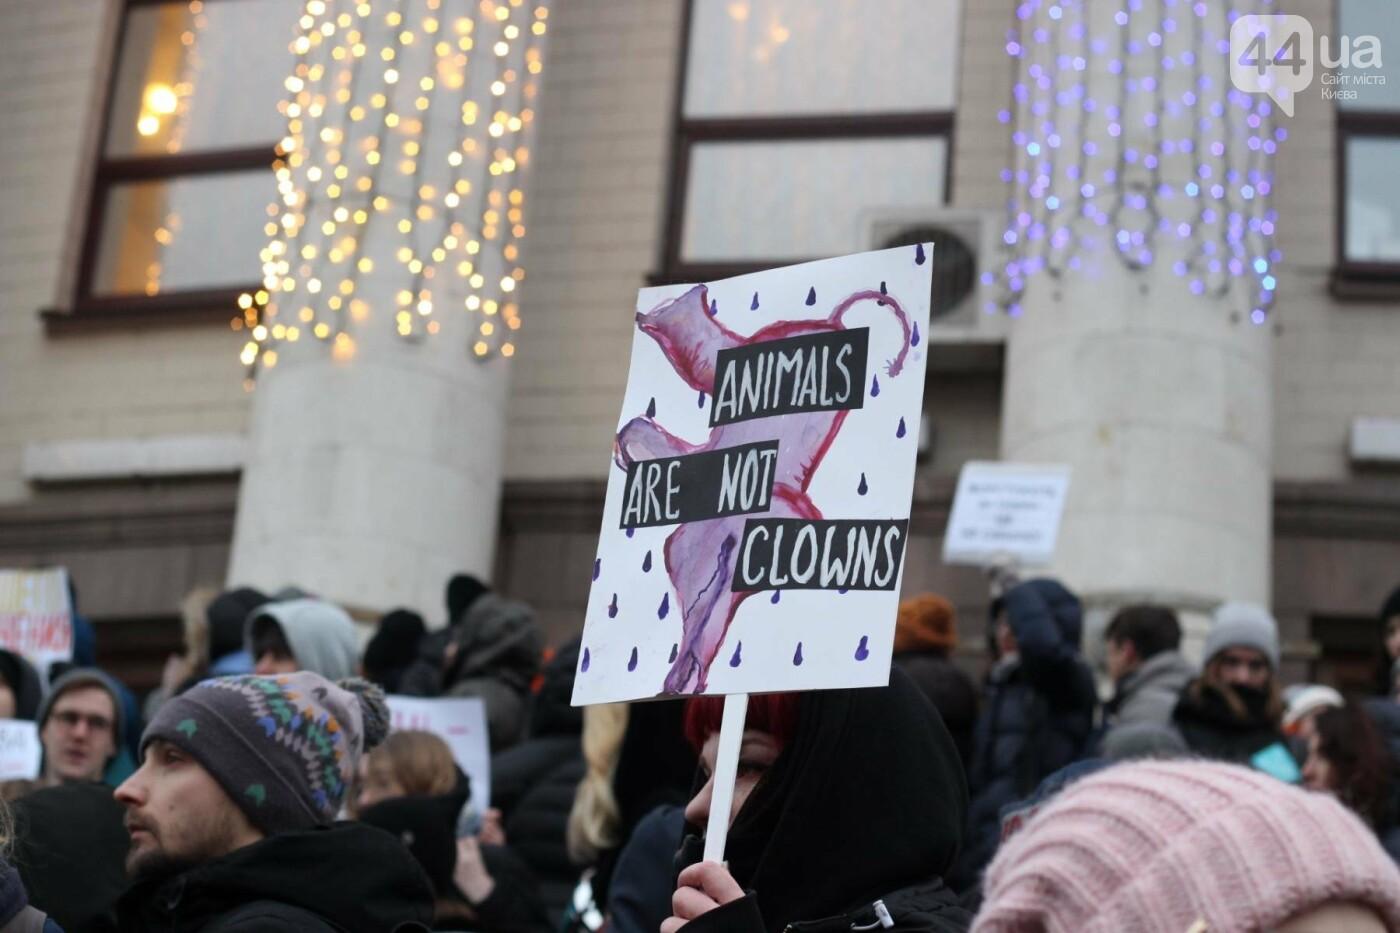 Цирк без животных: как в Киеве прошла акция протеста, фото-25